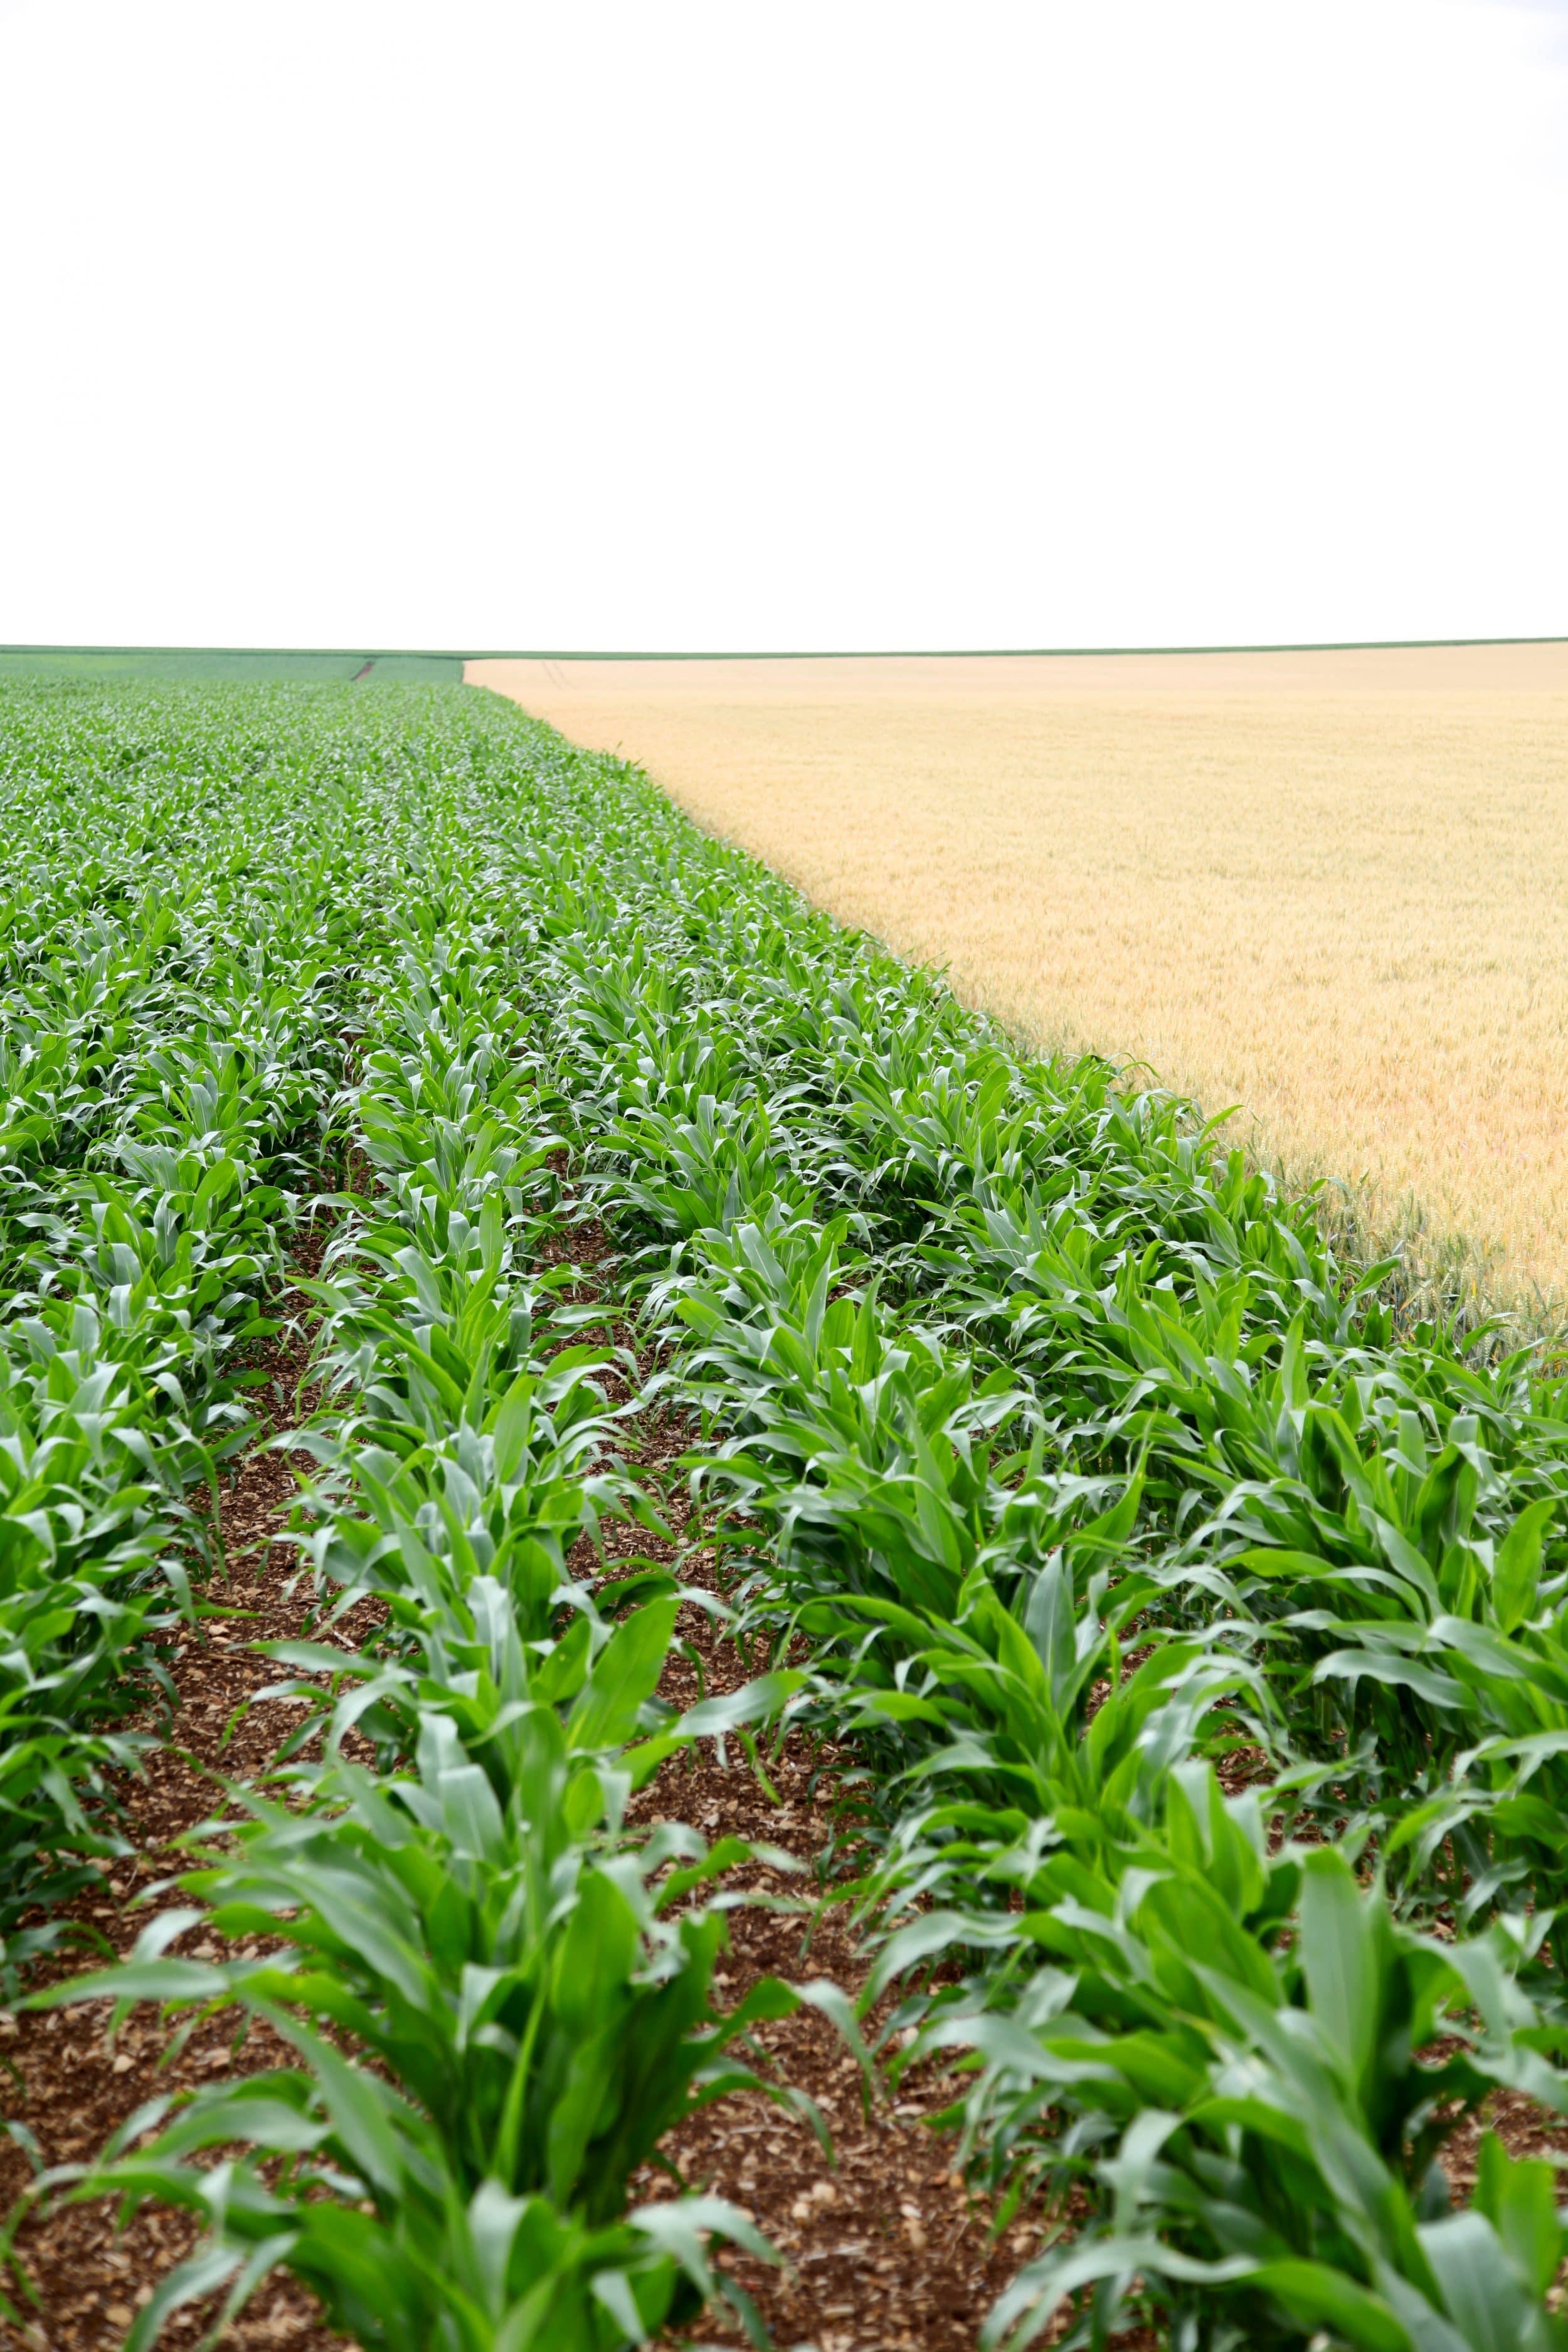 Closeup On Corn Crops